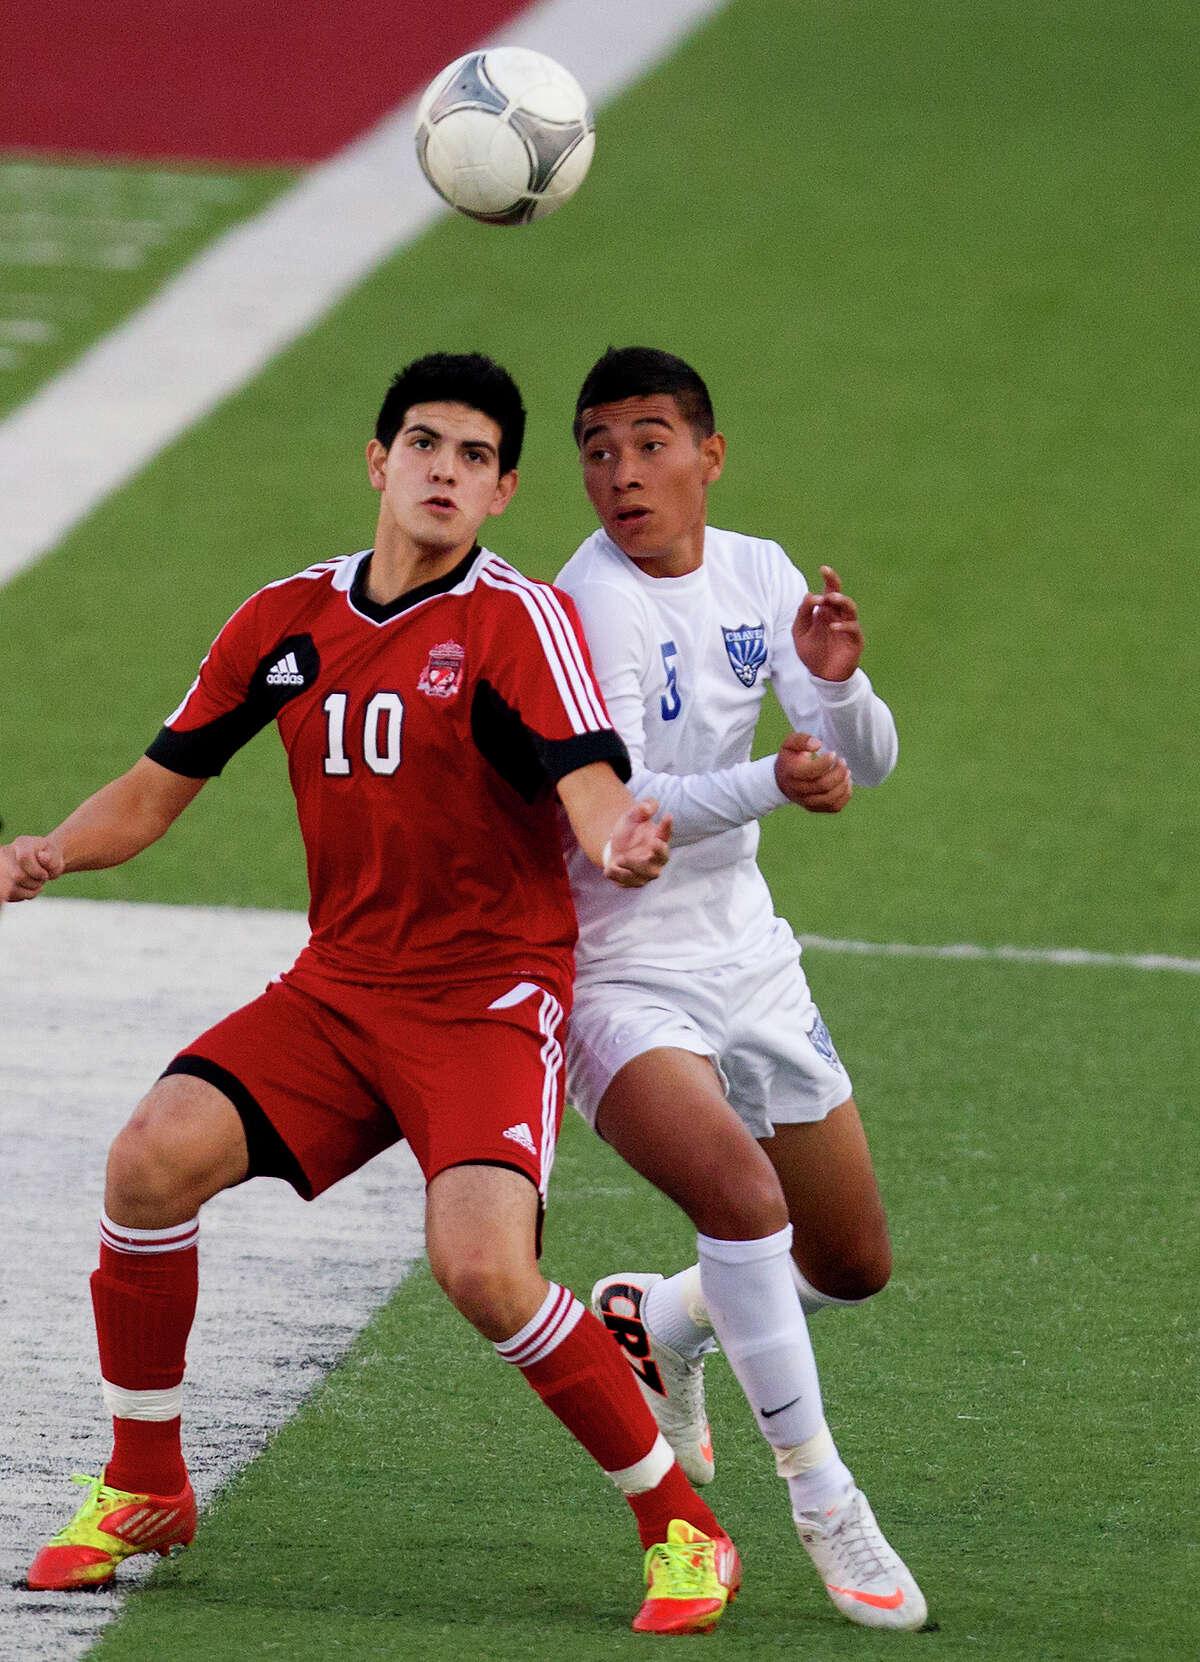 Langham Creek's Fernando Hernandez, left, battles Chavez's Kenneth Malagon during the first half. Hernandez scored the game-winner in the first half.